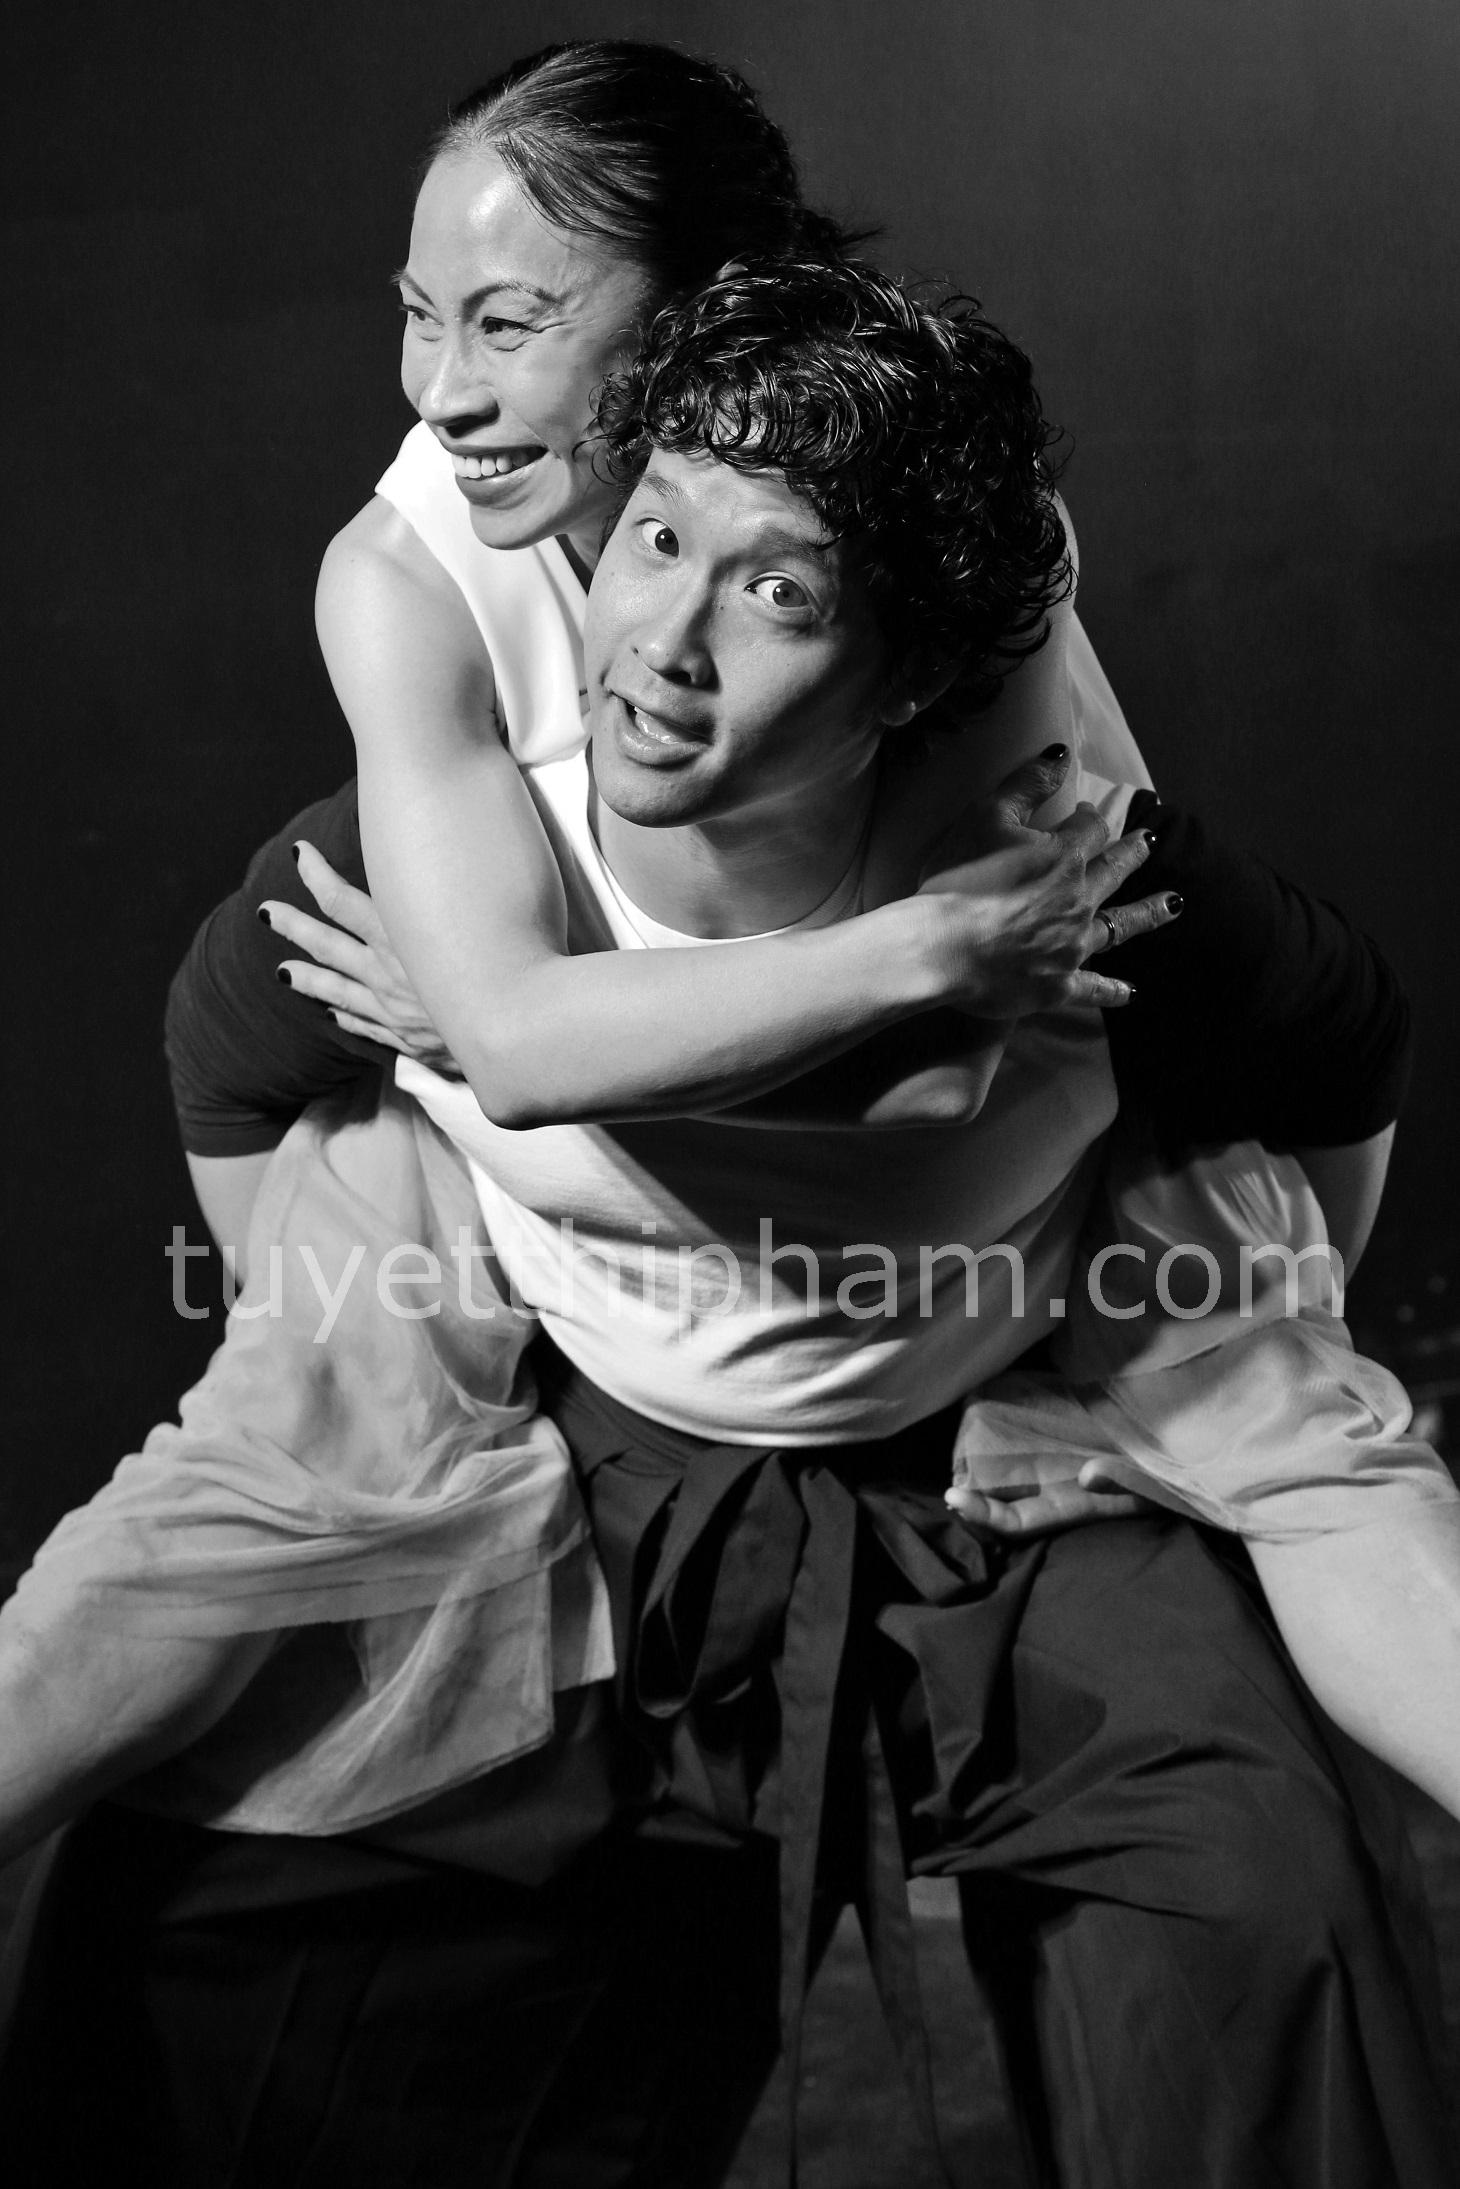 Photo Shoot fun-Jacob and Tuyet.jpg